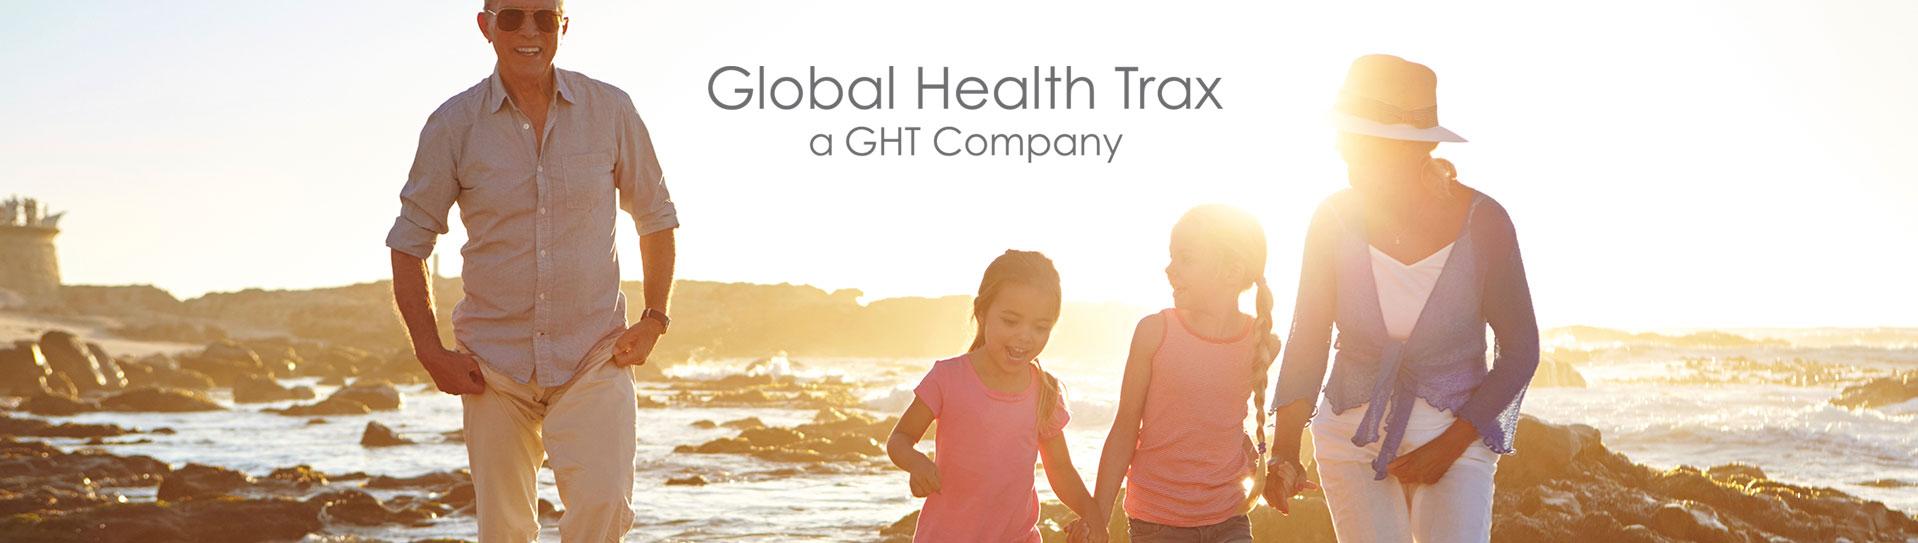 Global Health Trax a GHT company